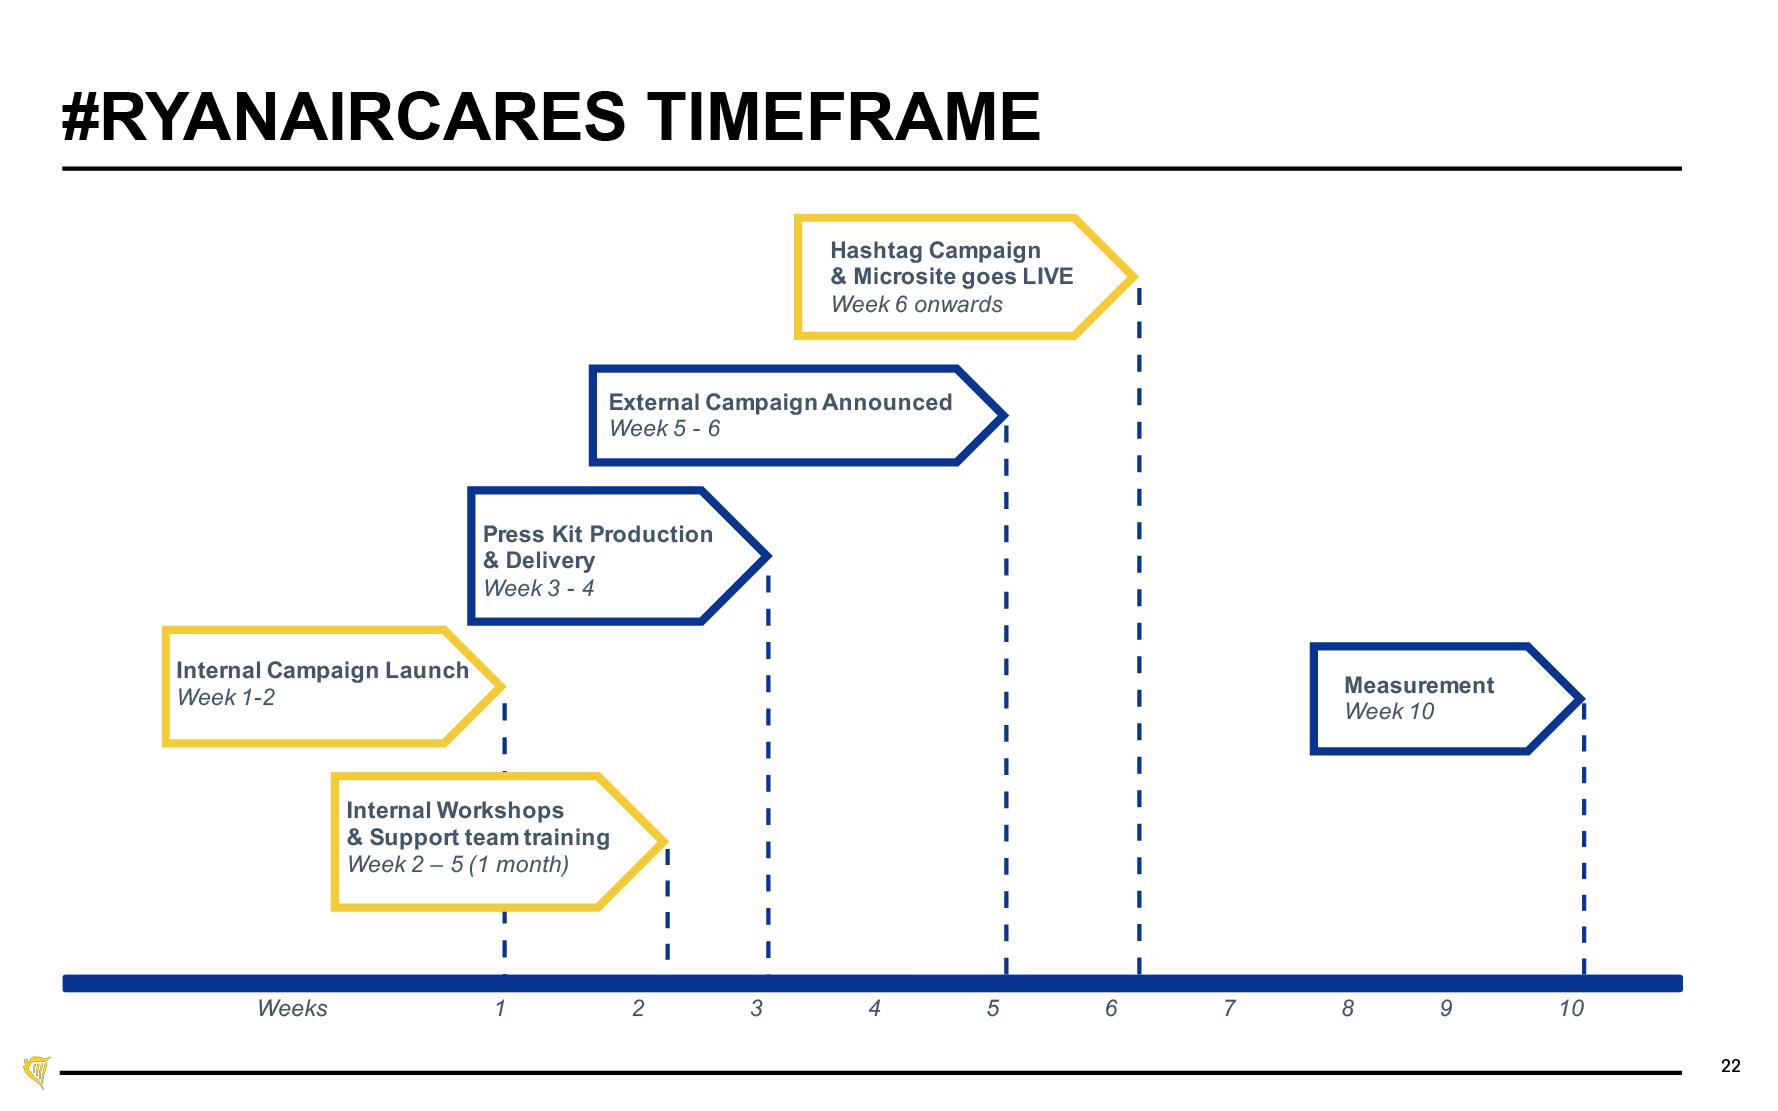 #RyanairCares Page422.png